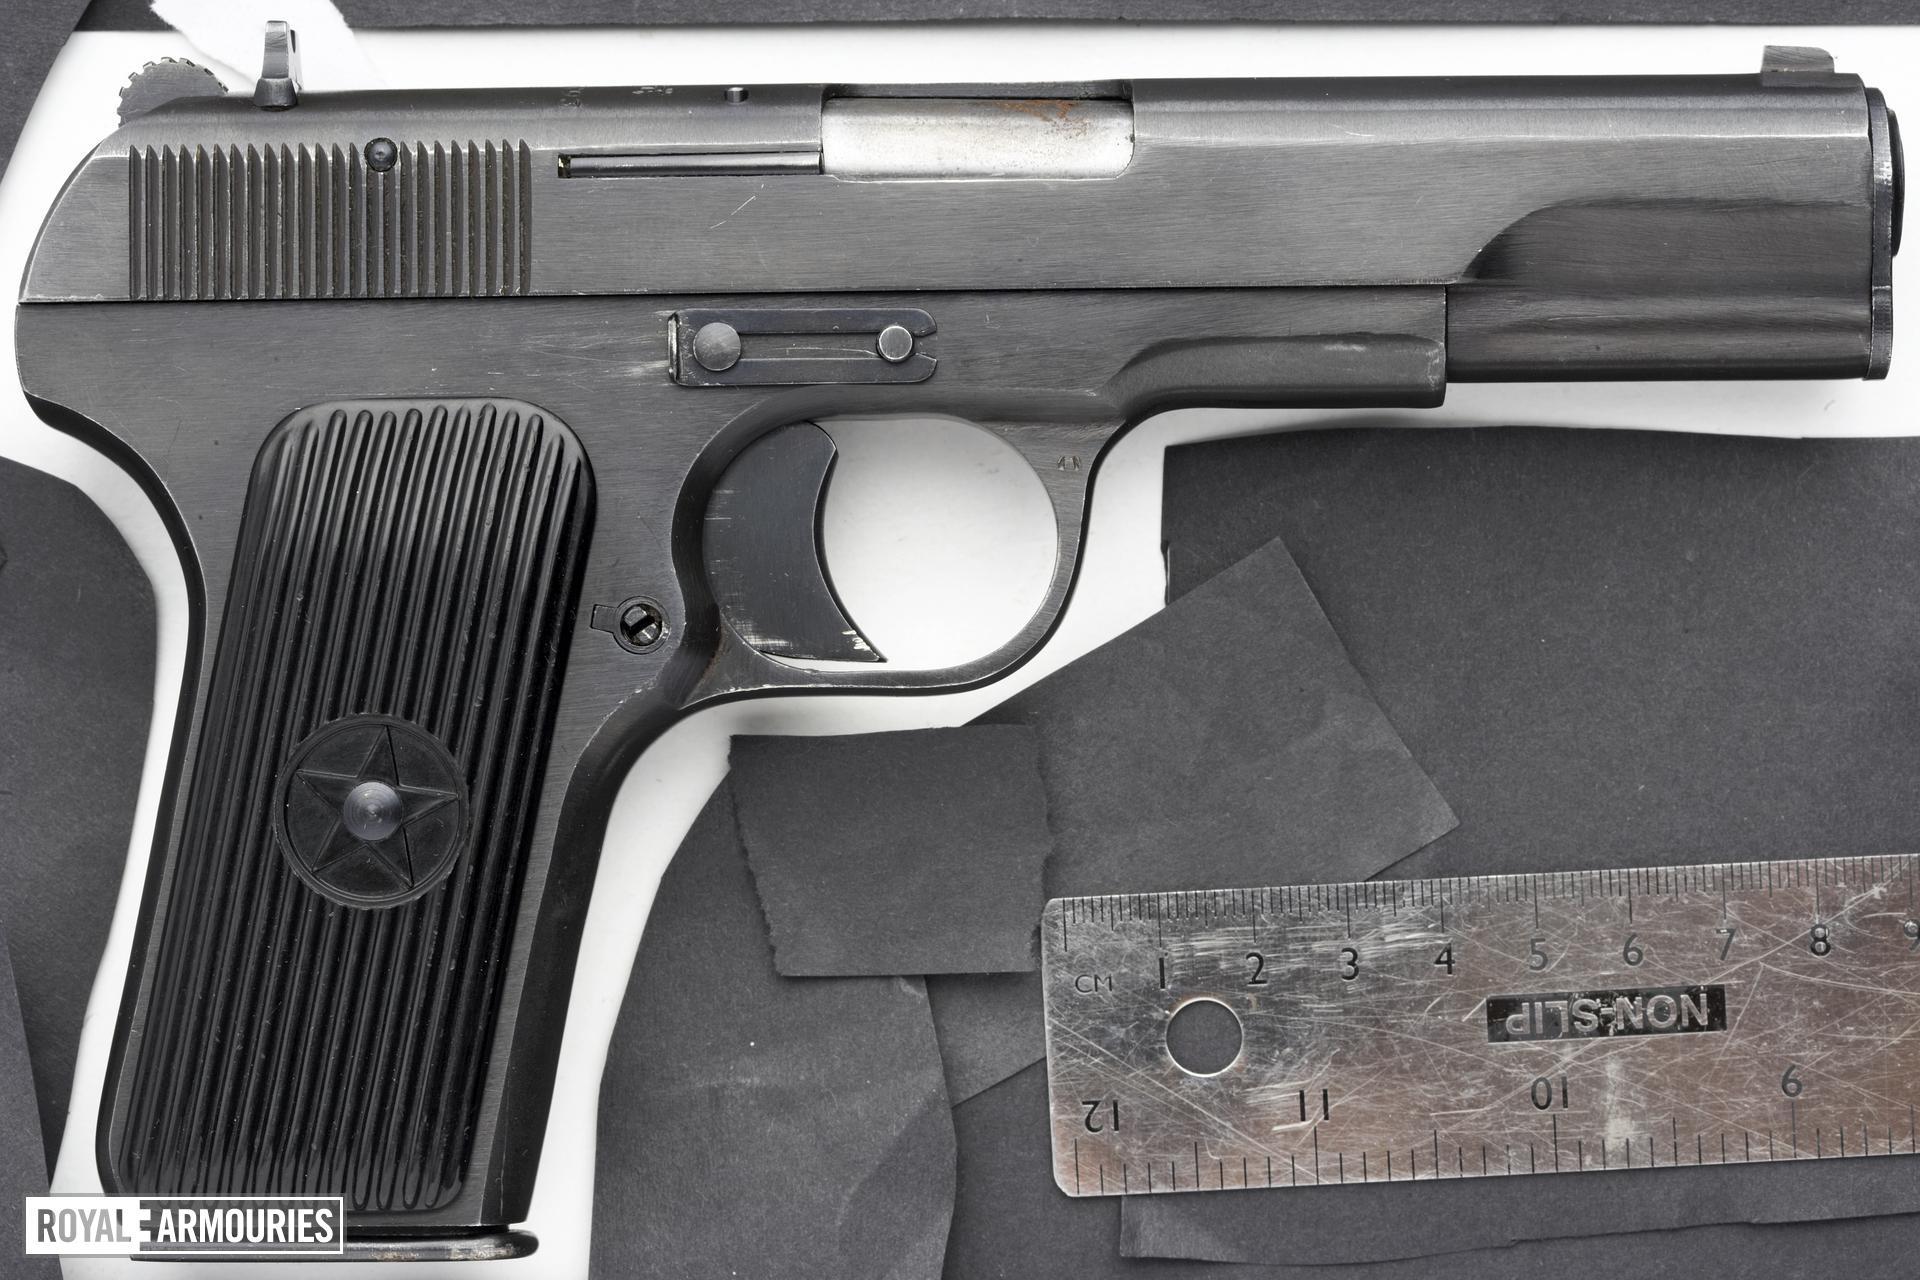 Centrefire self-loading pistol - Type 54 (Tokarev)